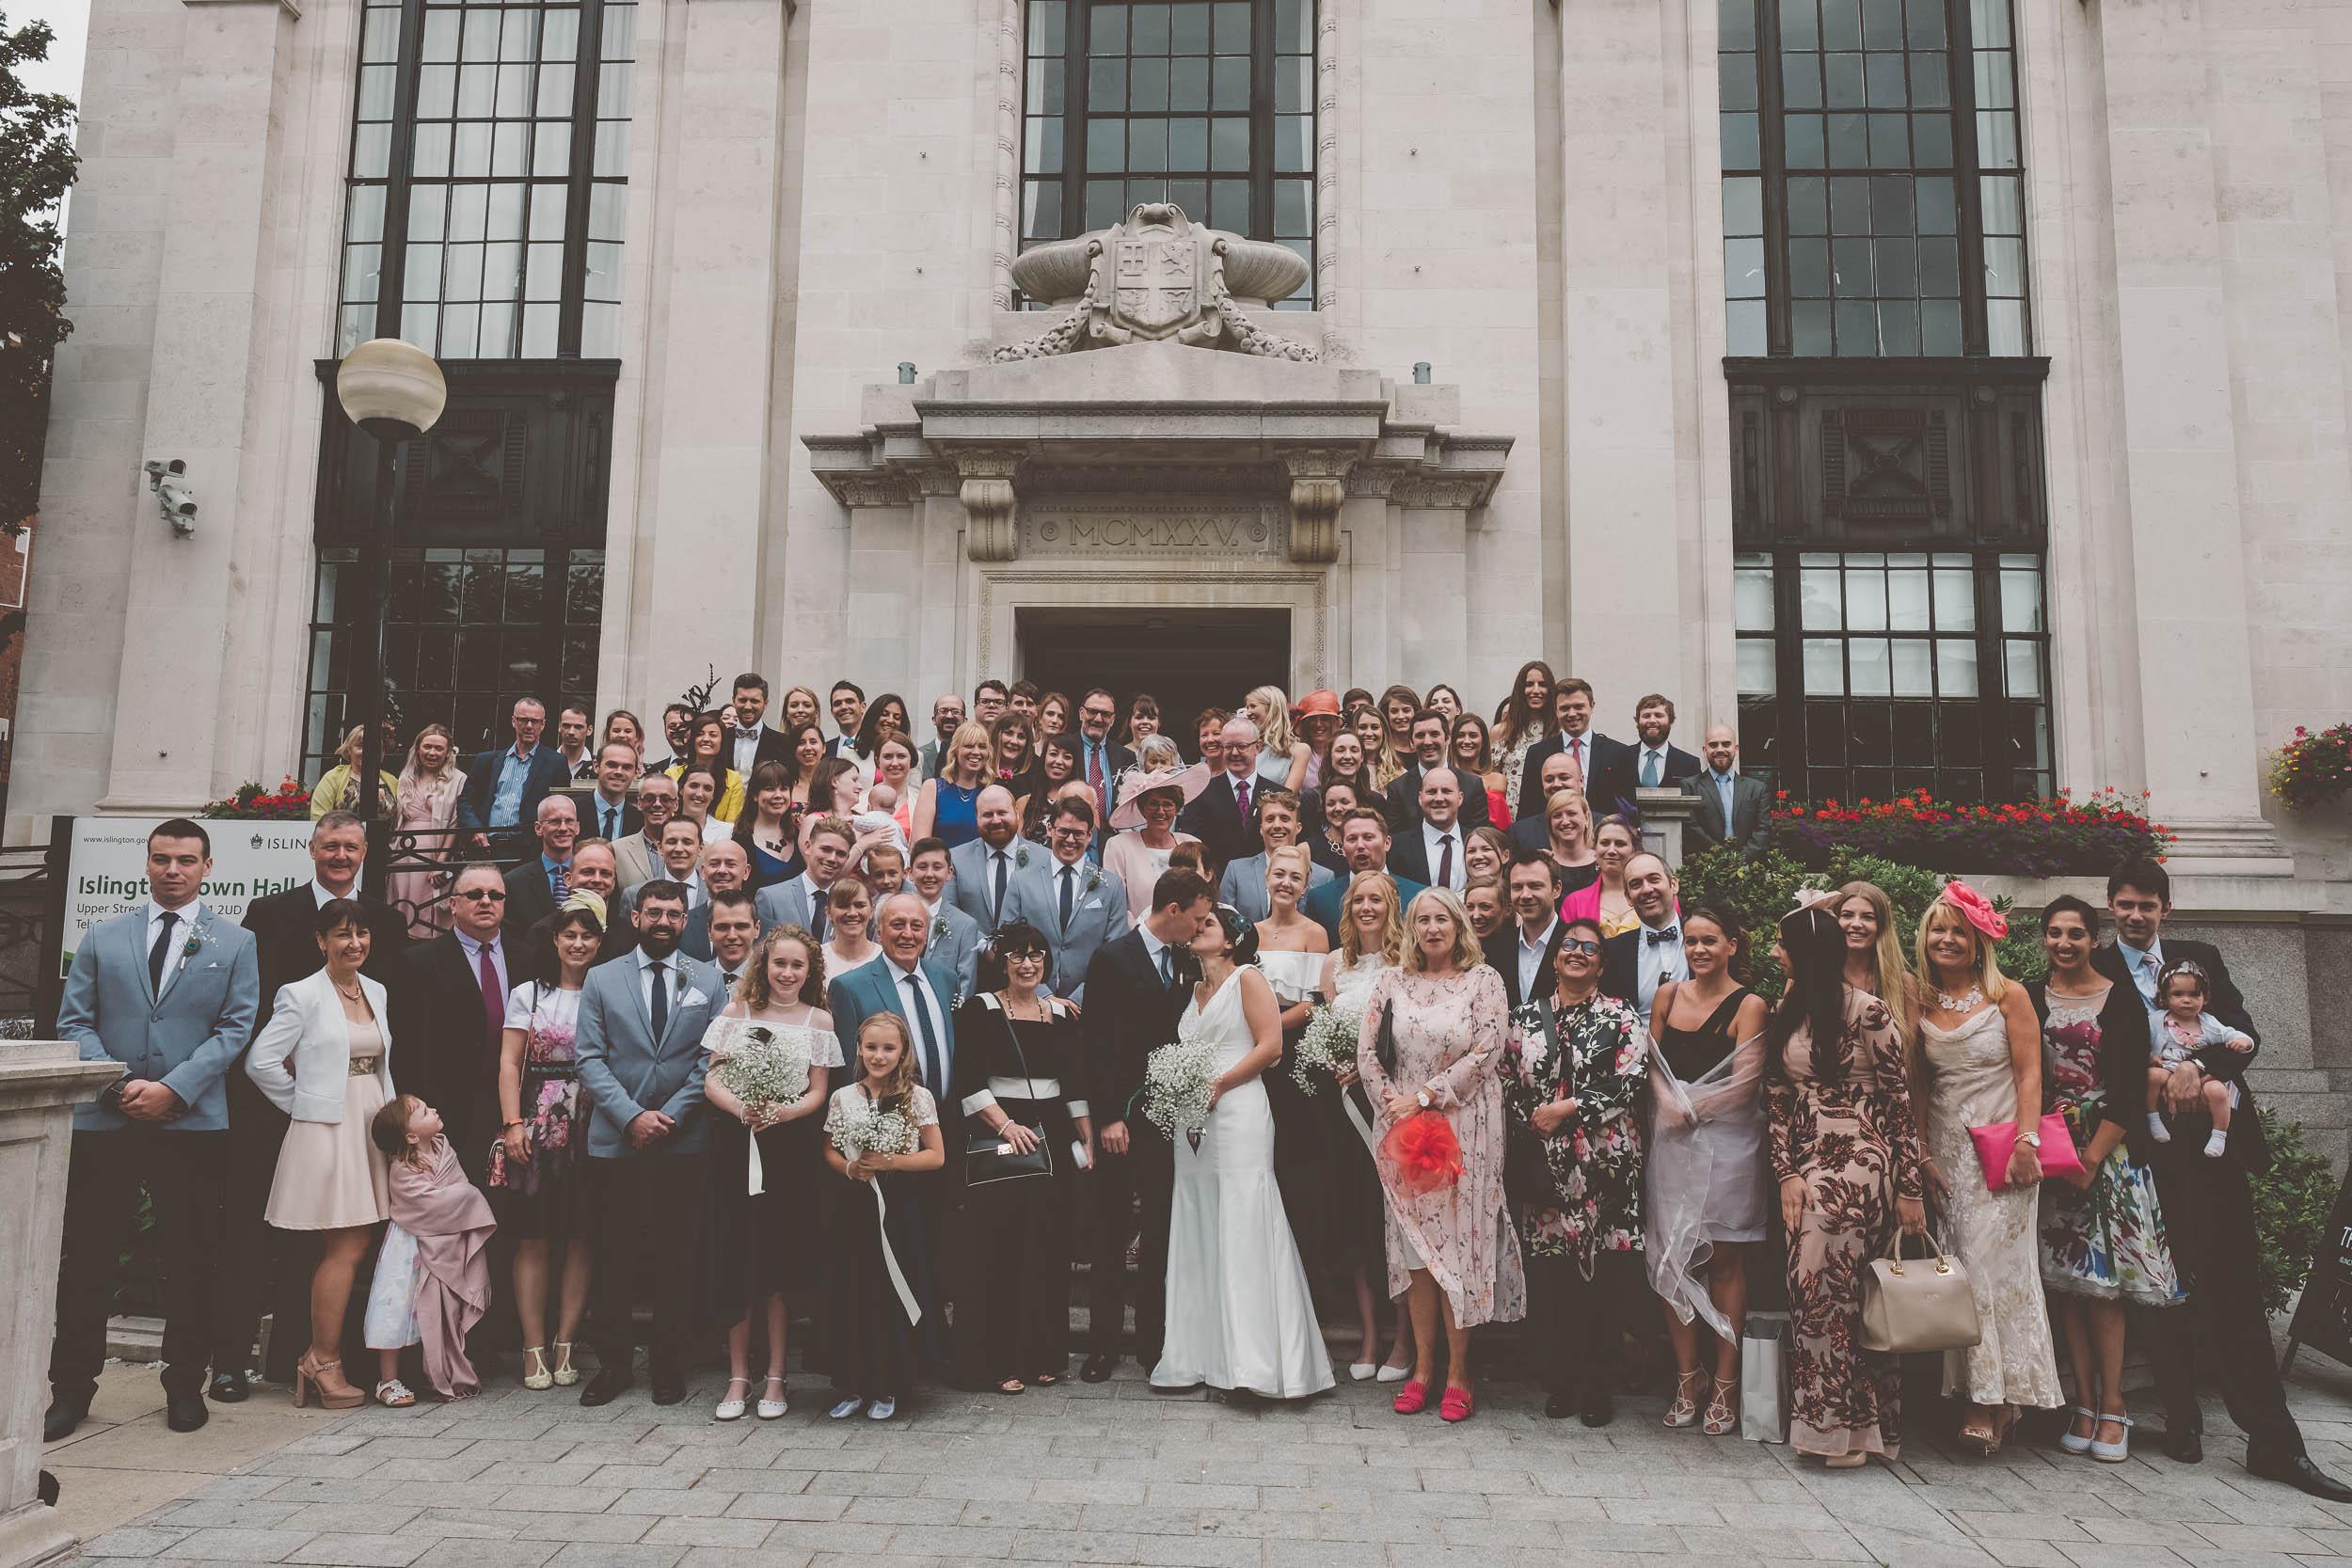 islington-town-hall-4th-floor-studios-wedding170.jpg